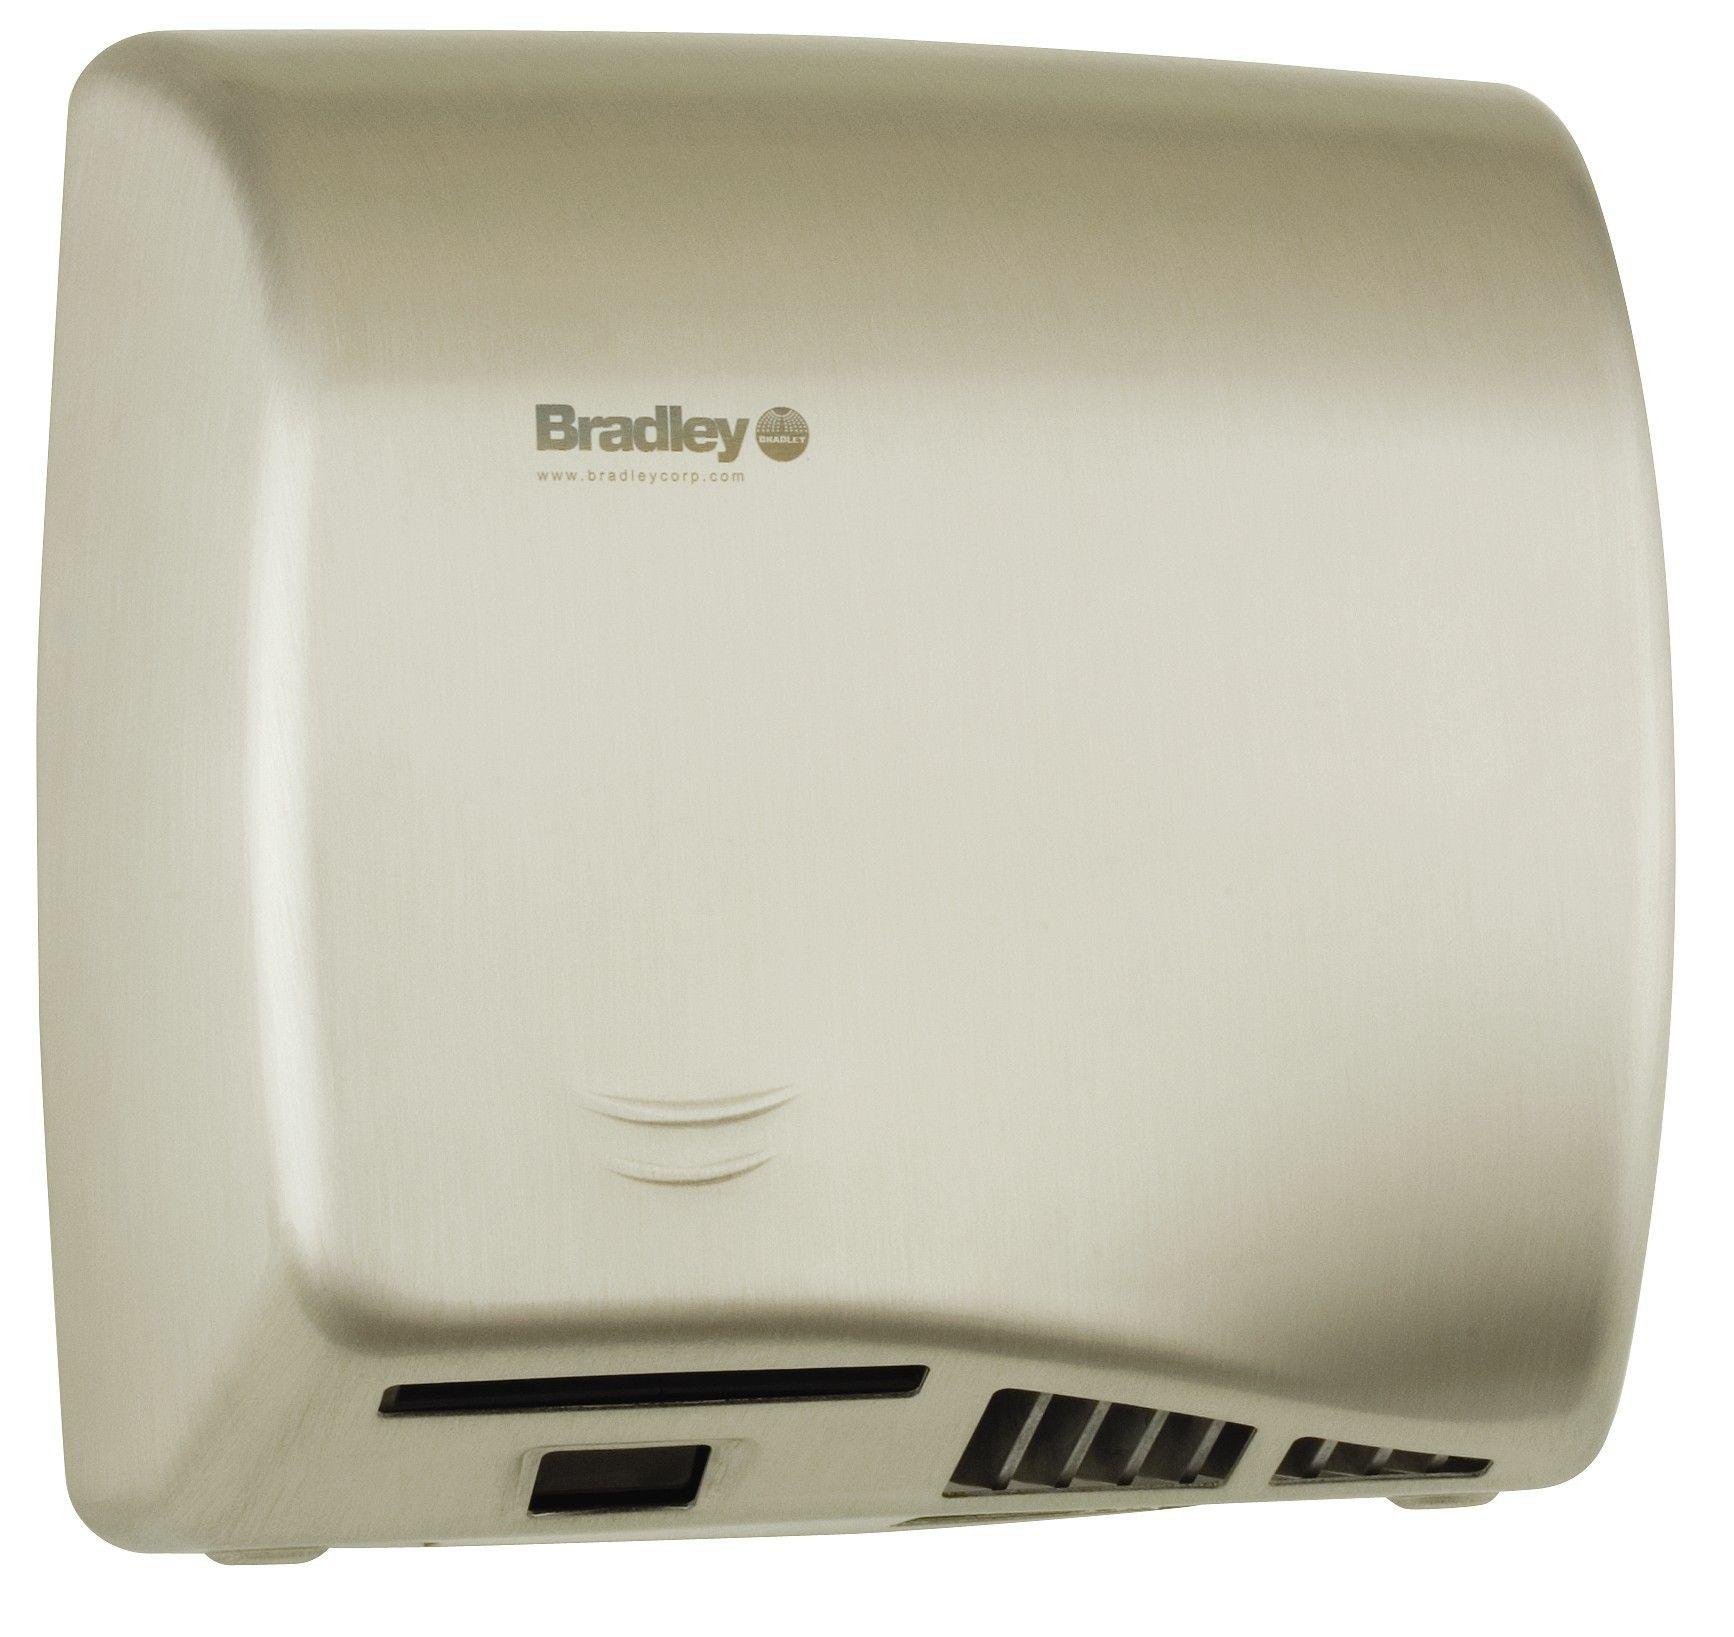 BRADLEY 2902287400 BX, SURFACE MOUNT, SENSOROPERATED